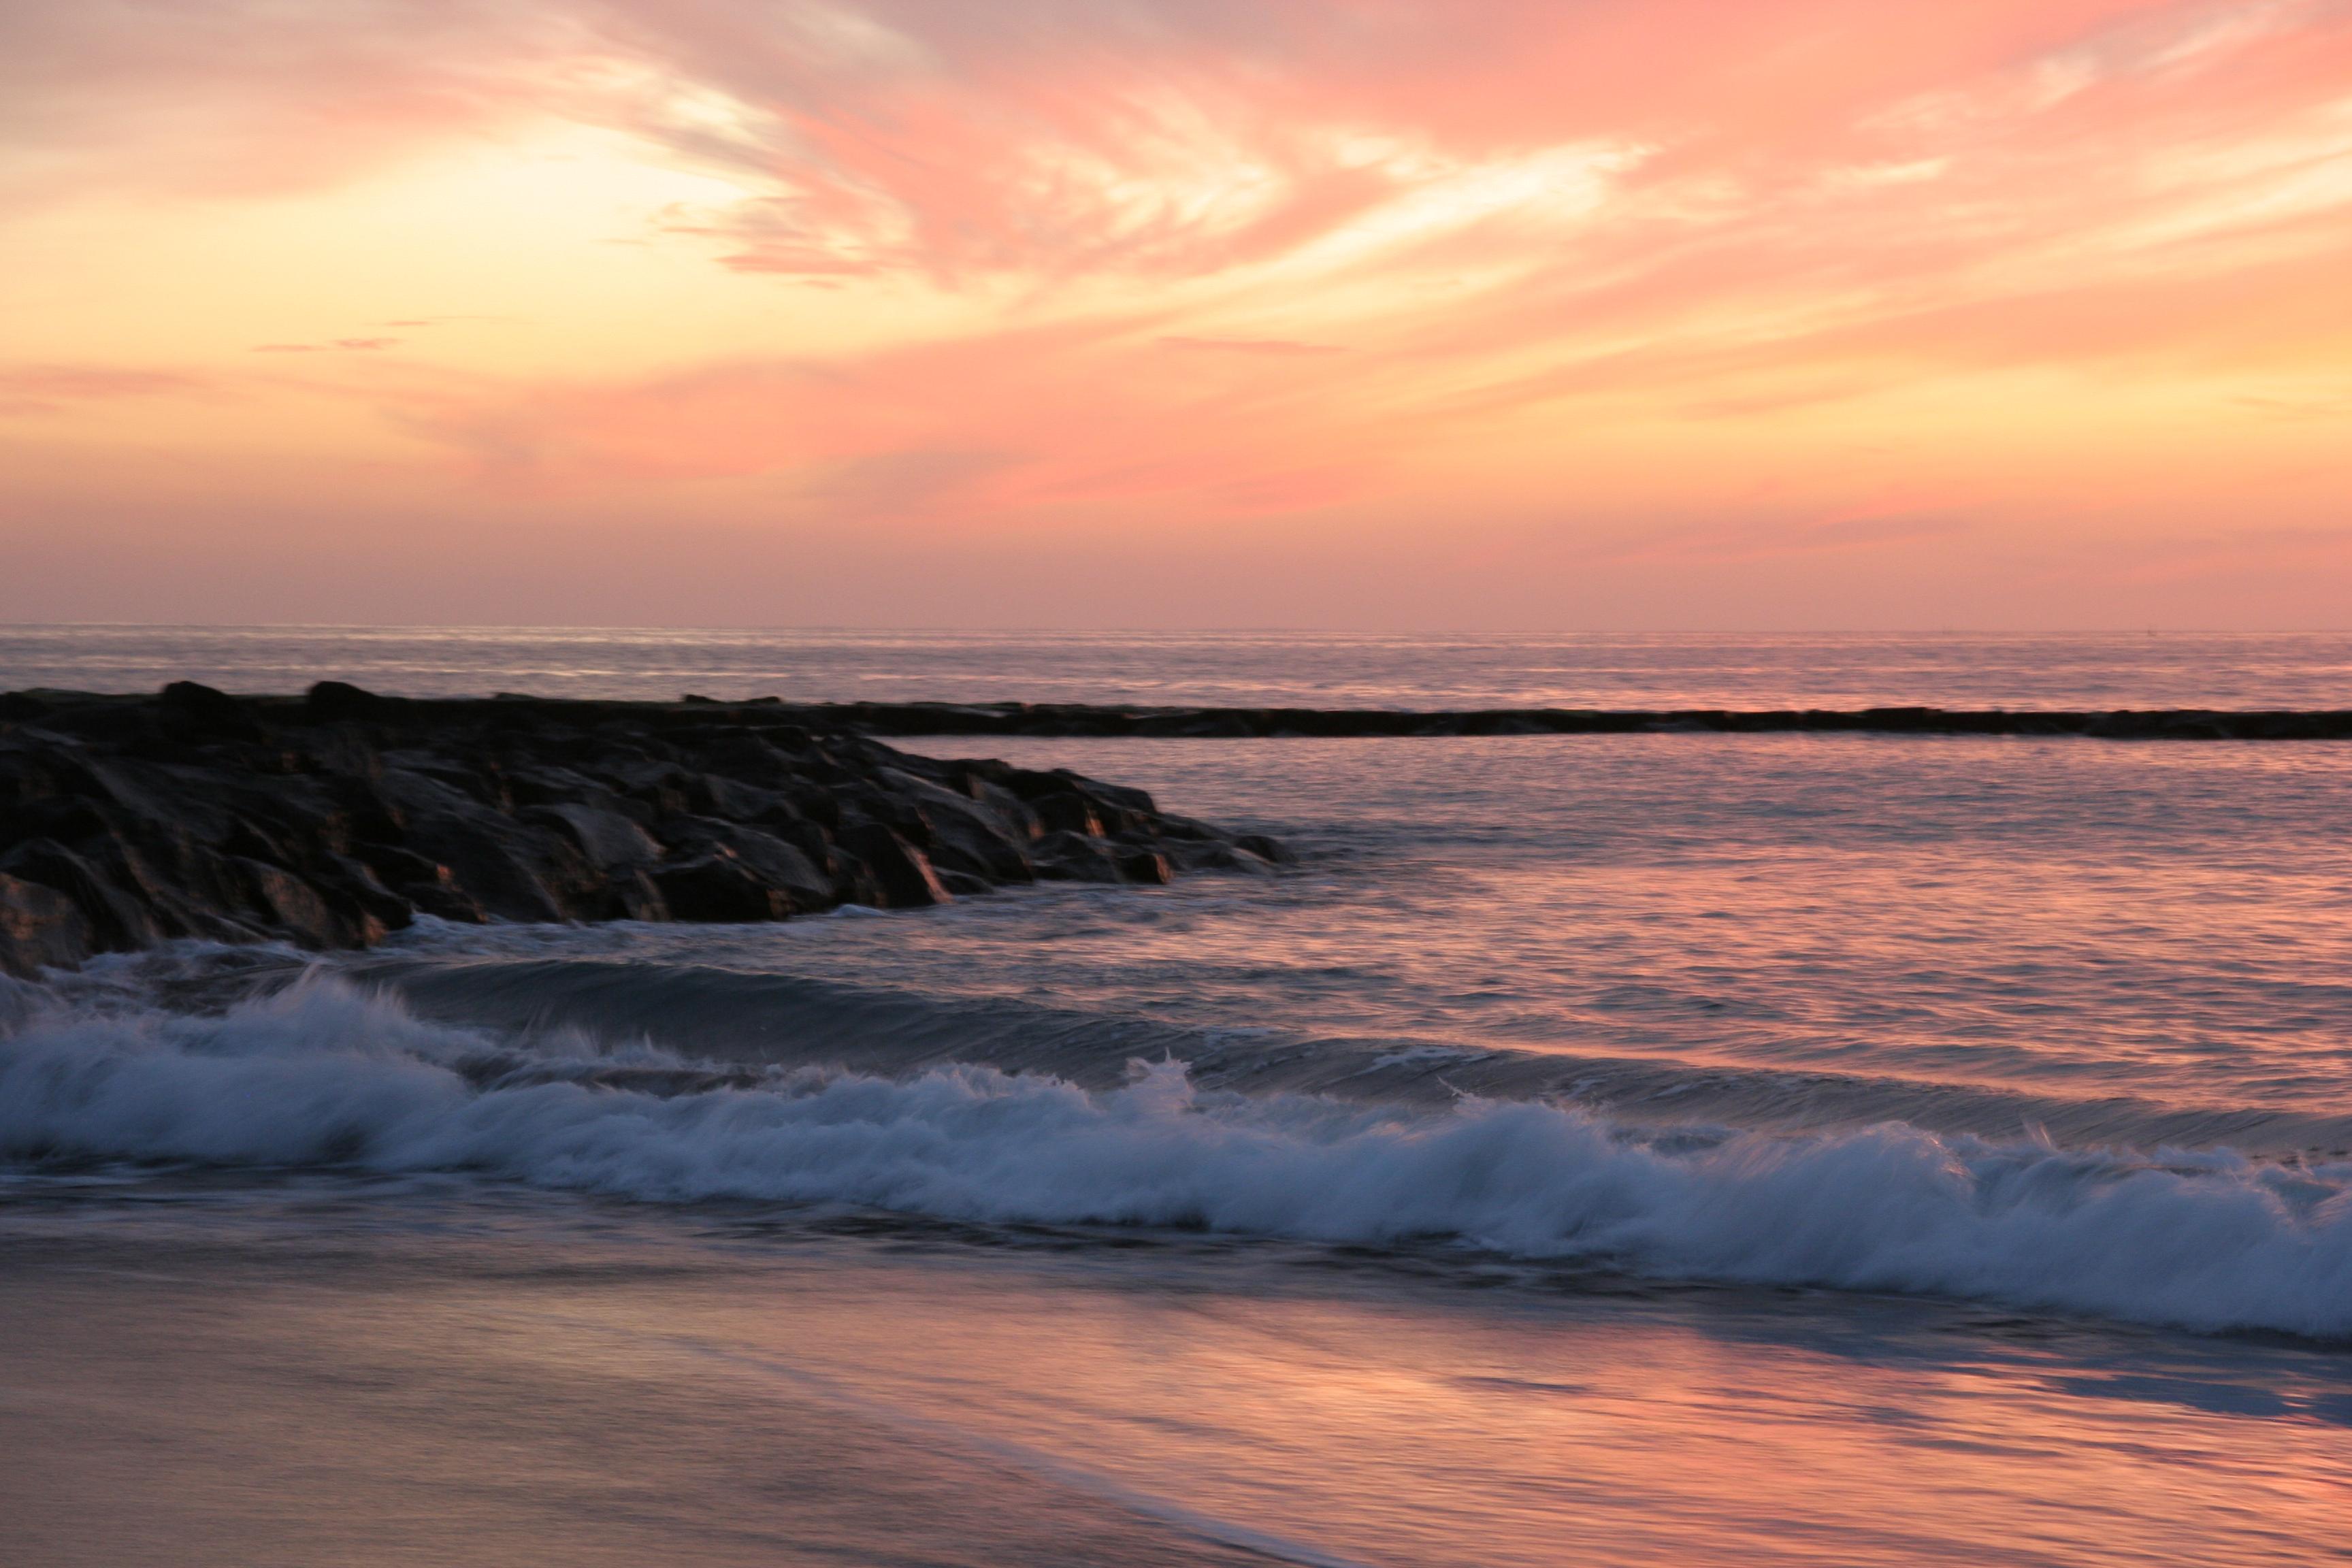 Sunset Way St Pete Beach